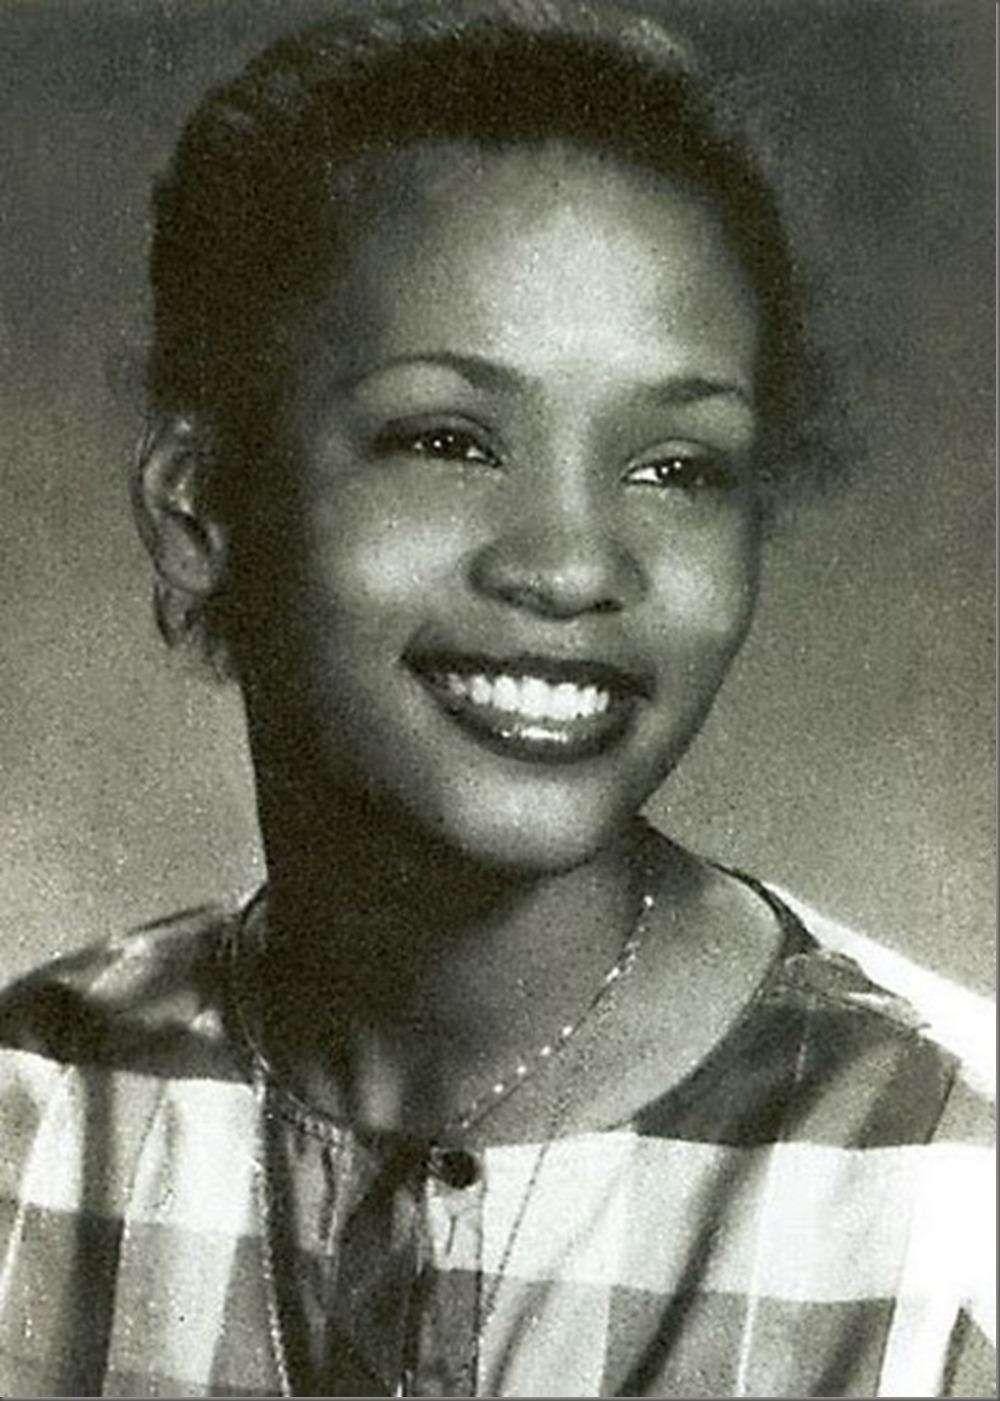 Whitney houston open casket photos review National Enquirer publisher calls Whitney Houston casket photo